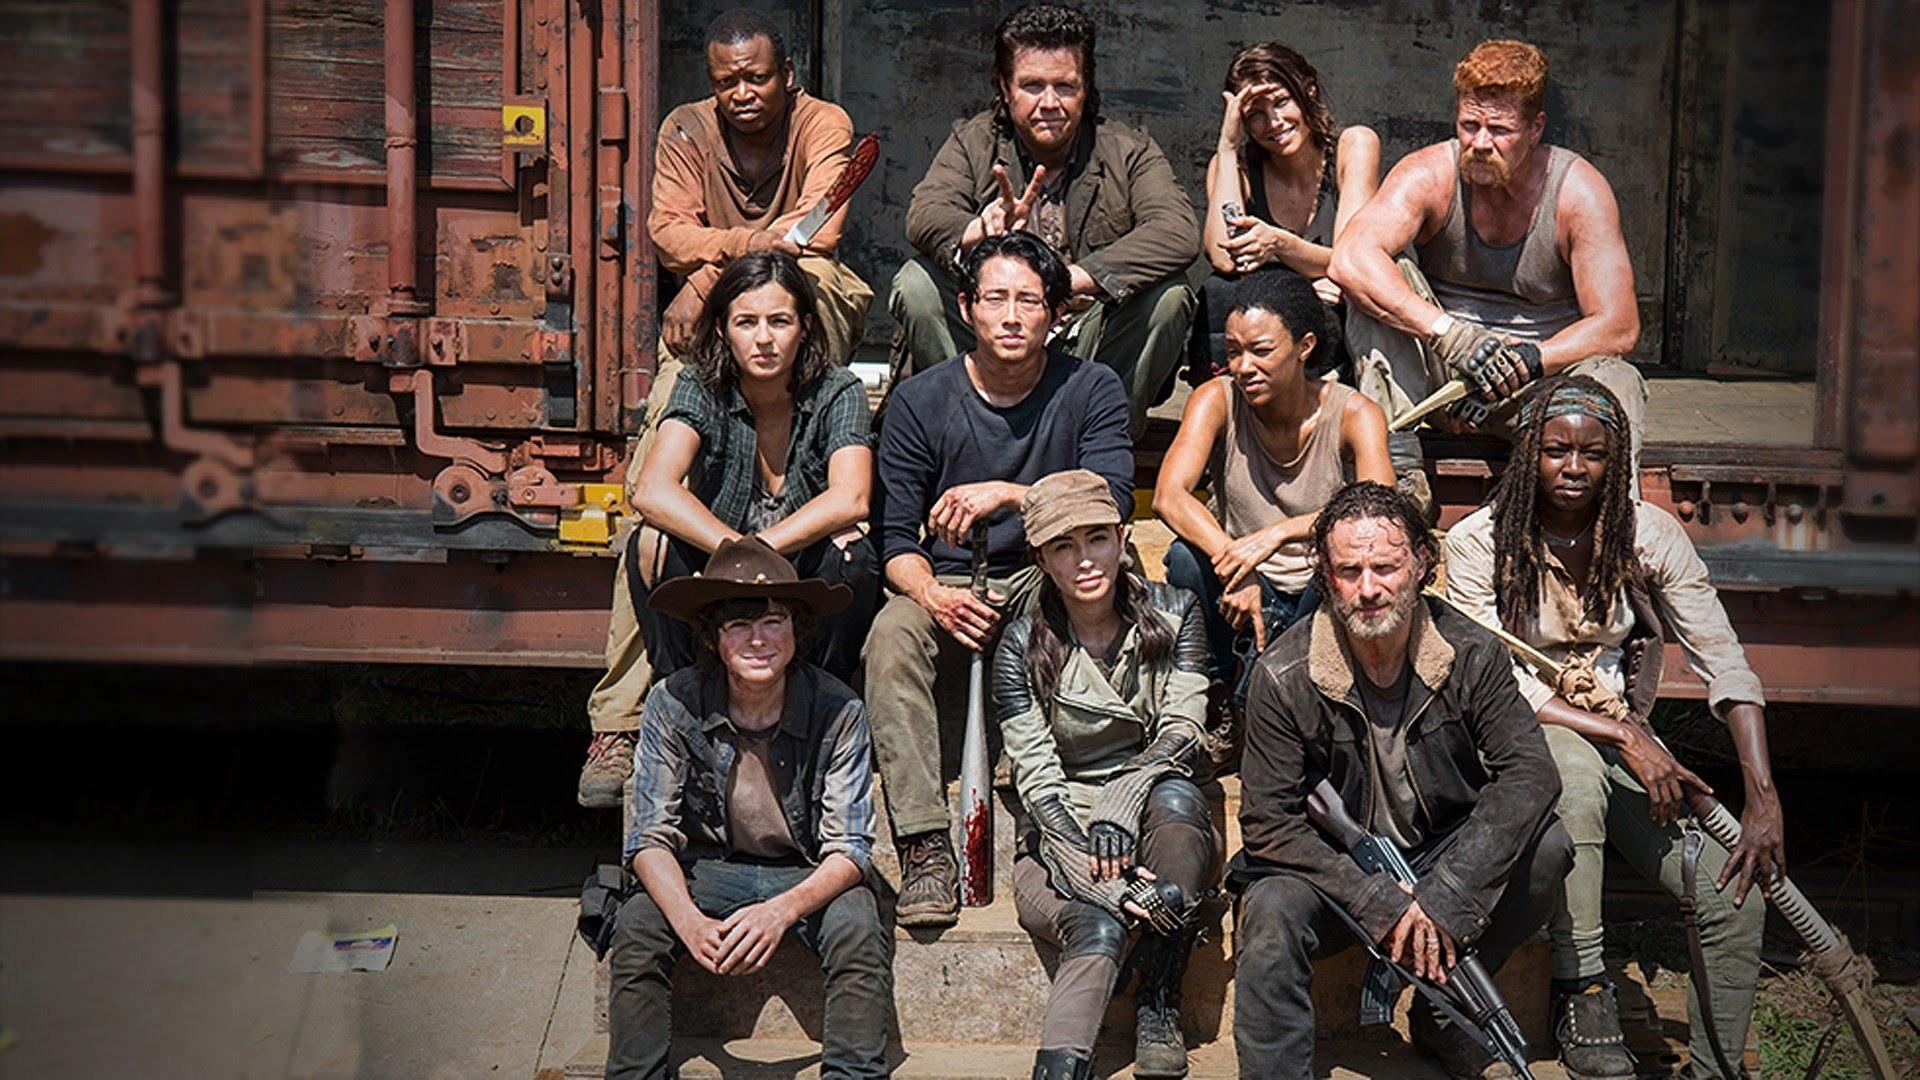 The Walking Dead Season 5 Wallpaper Wallpapertag